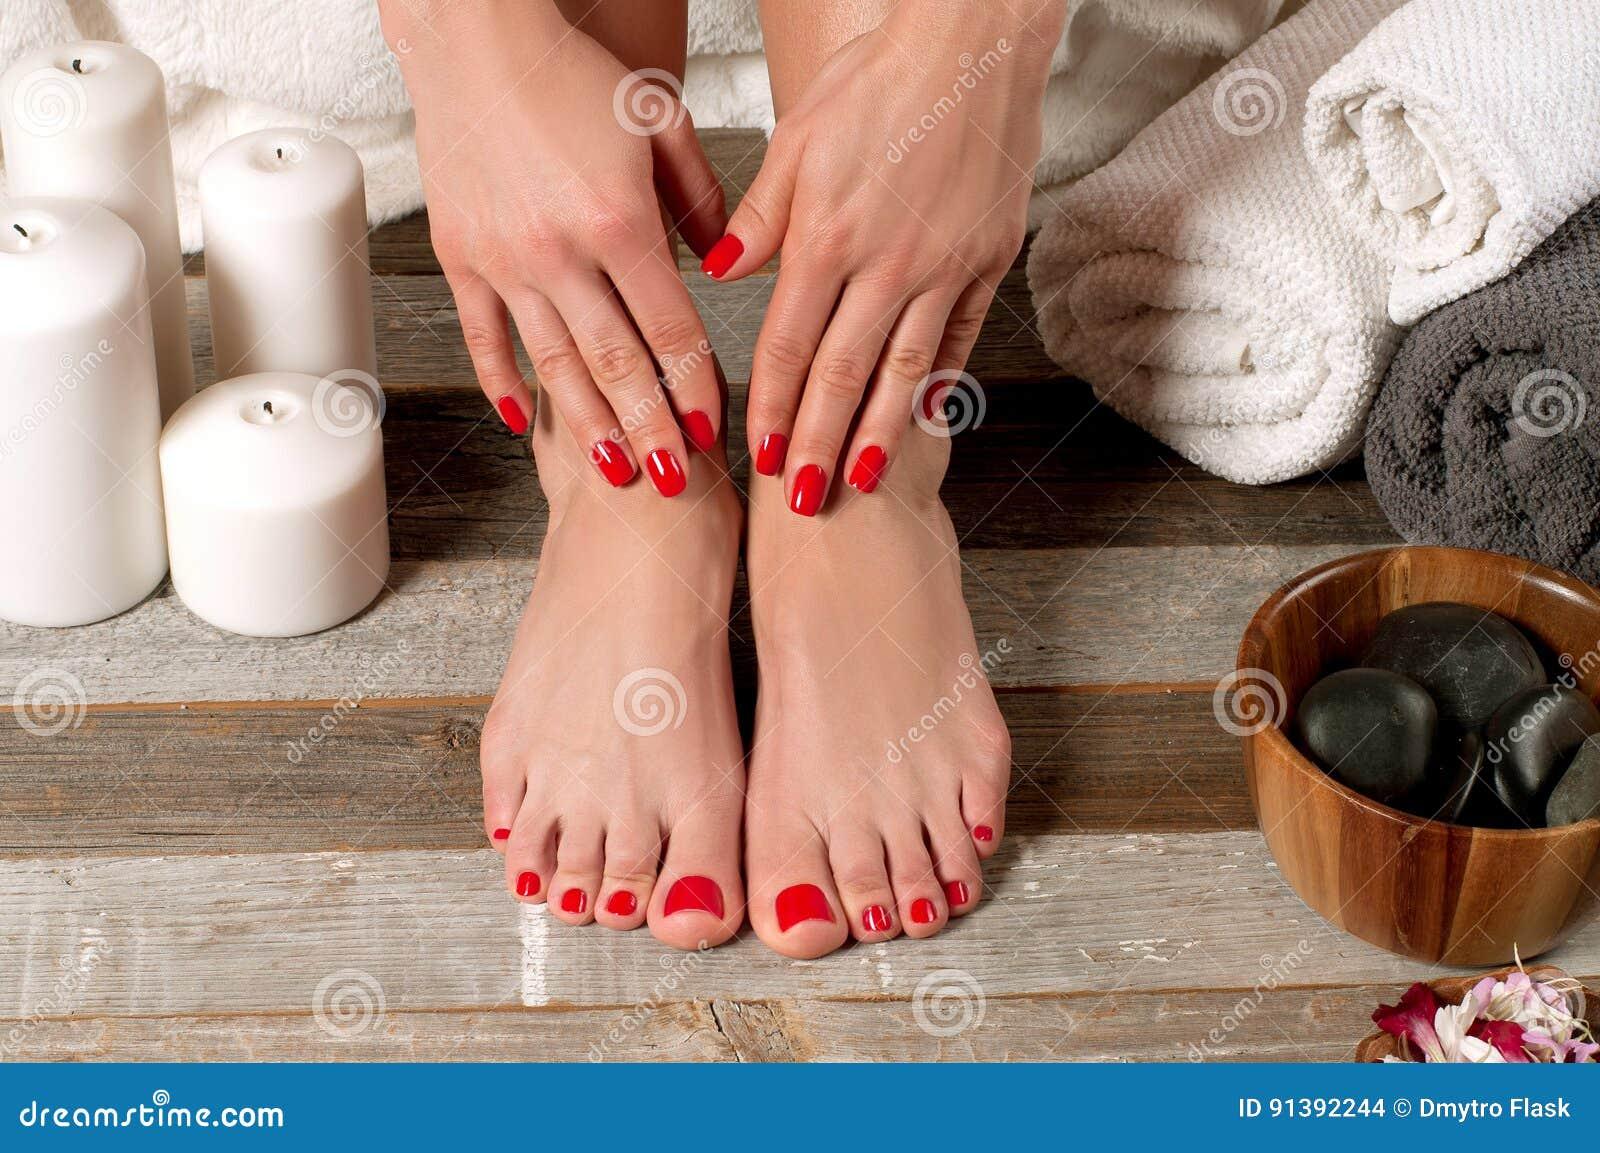 Female feet in spa salon, pedicure procedure